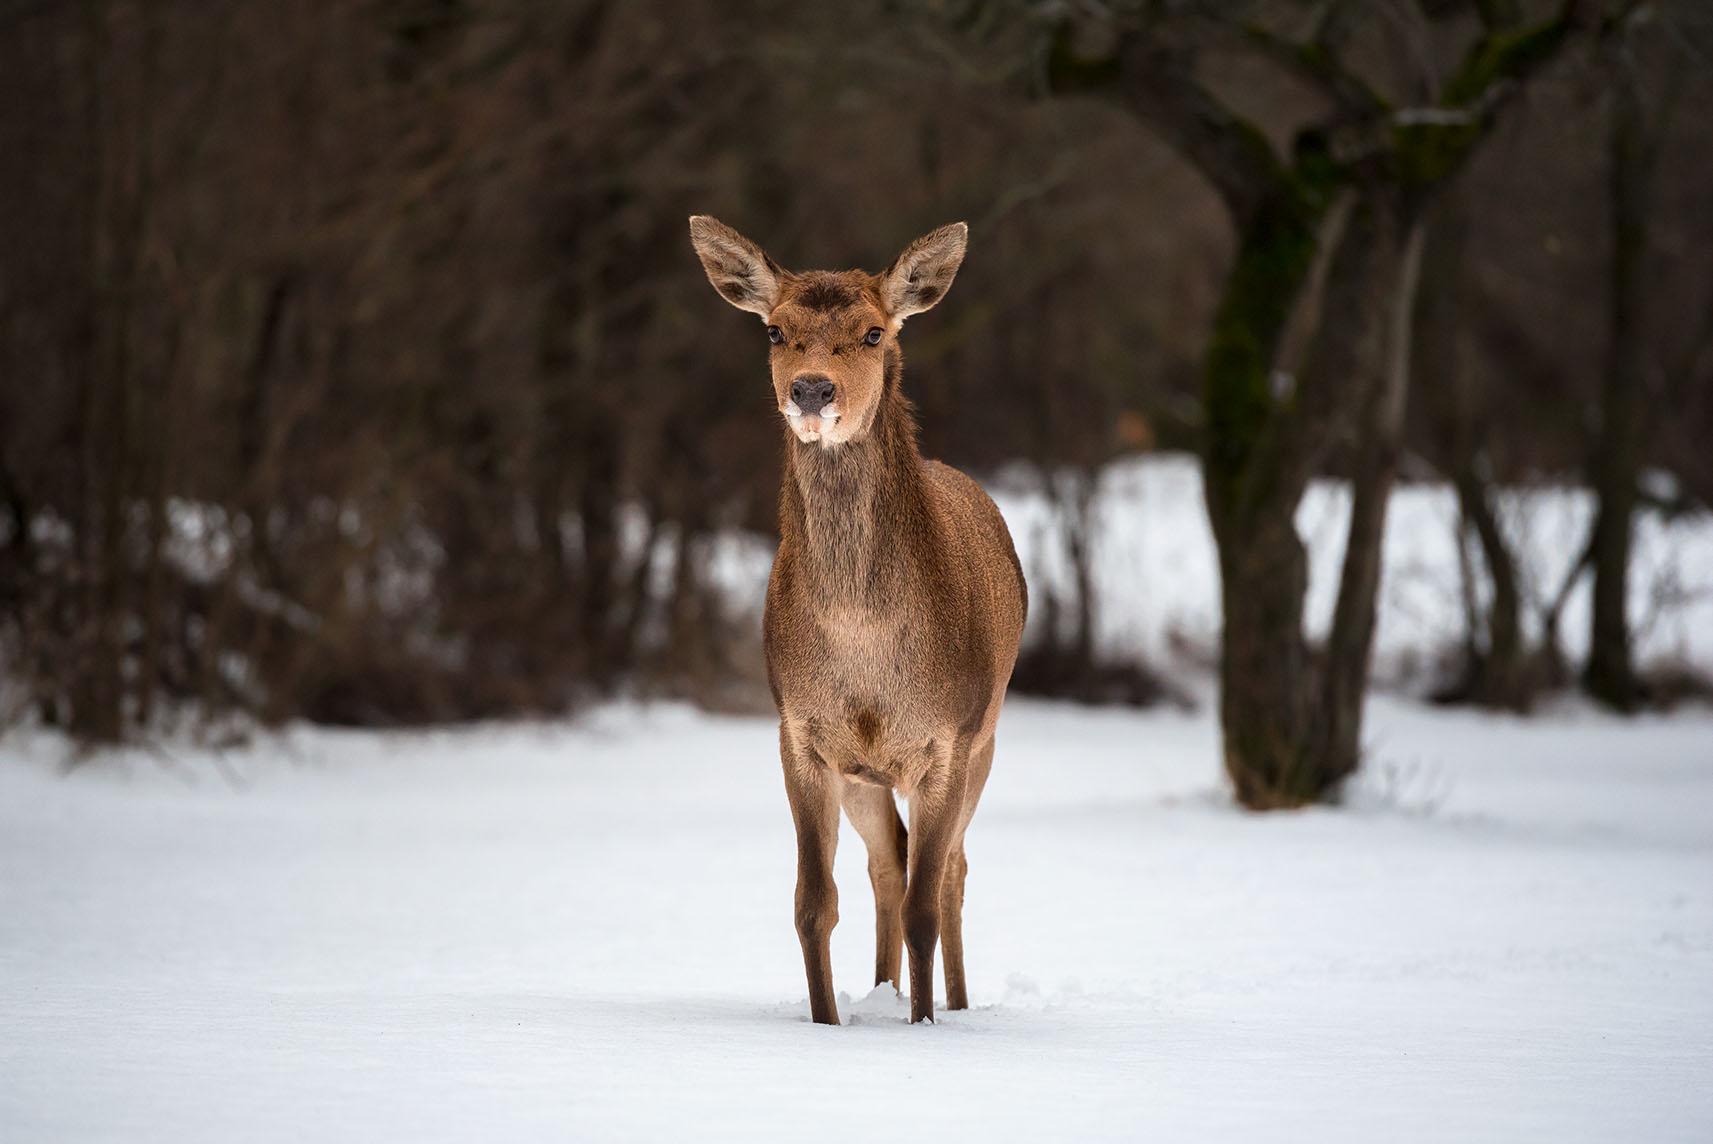 Cervo Abruzzo fauna camosciara